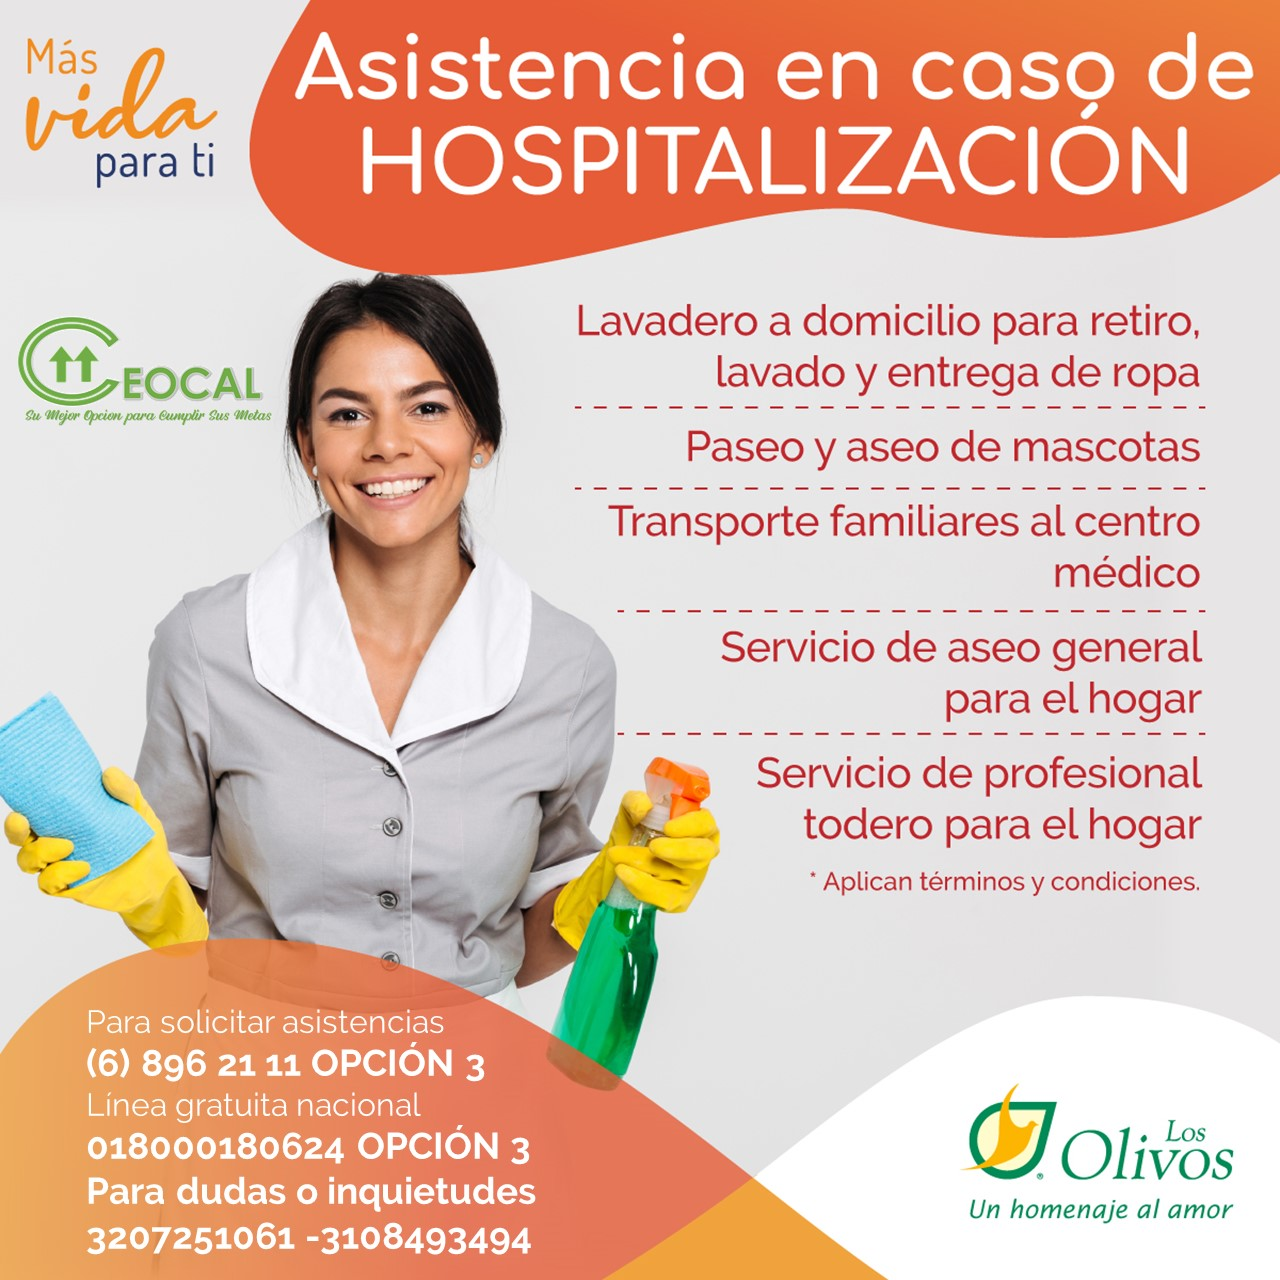 Asis Hospitalizacion